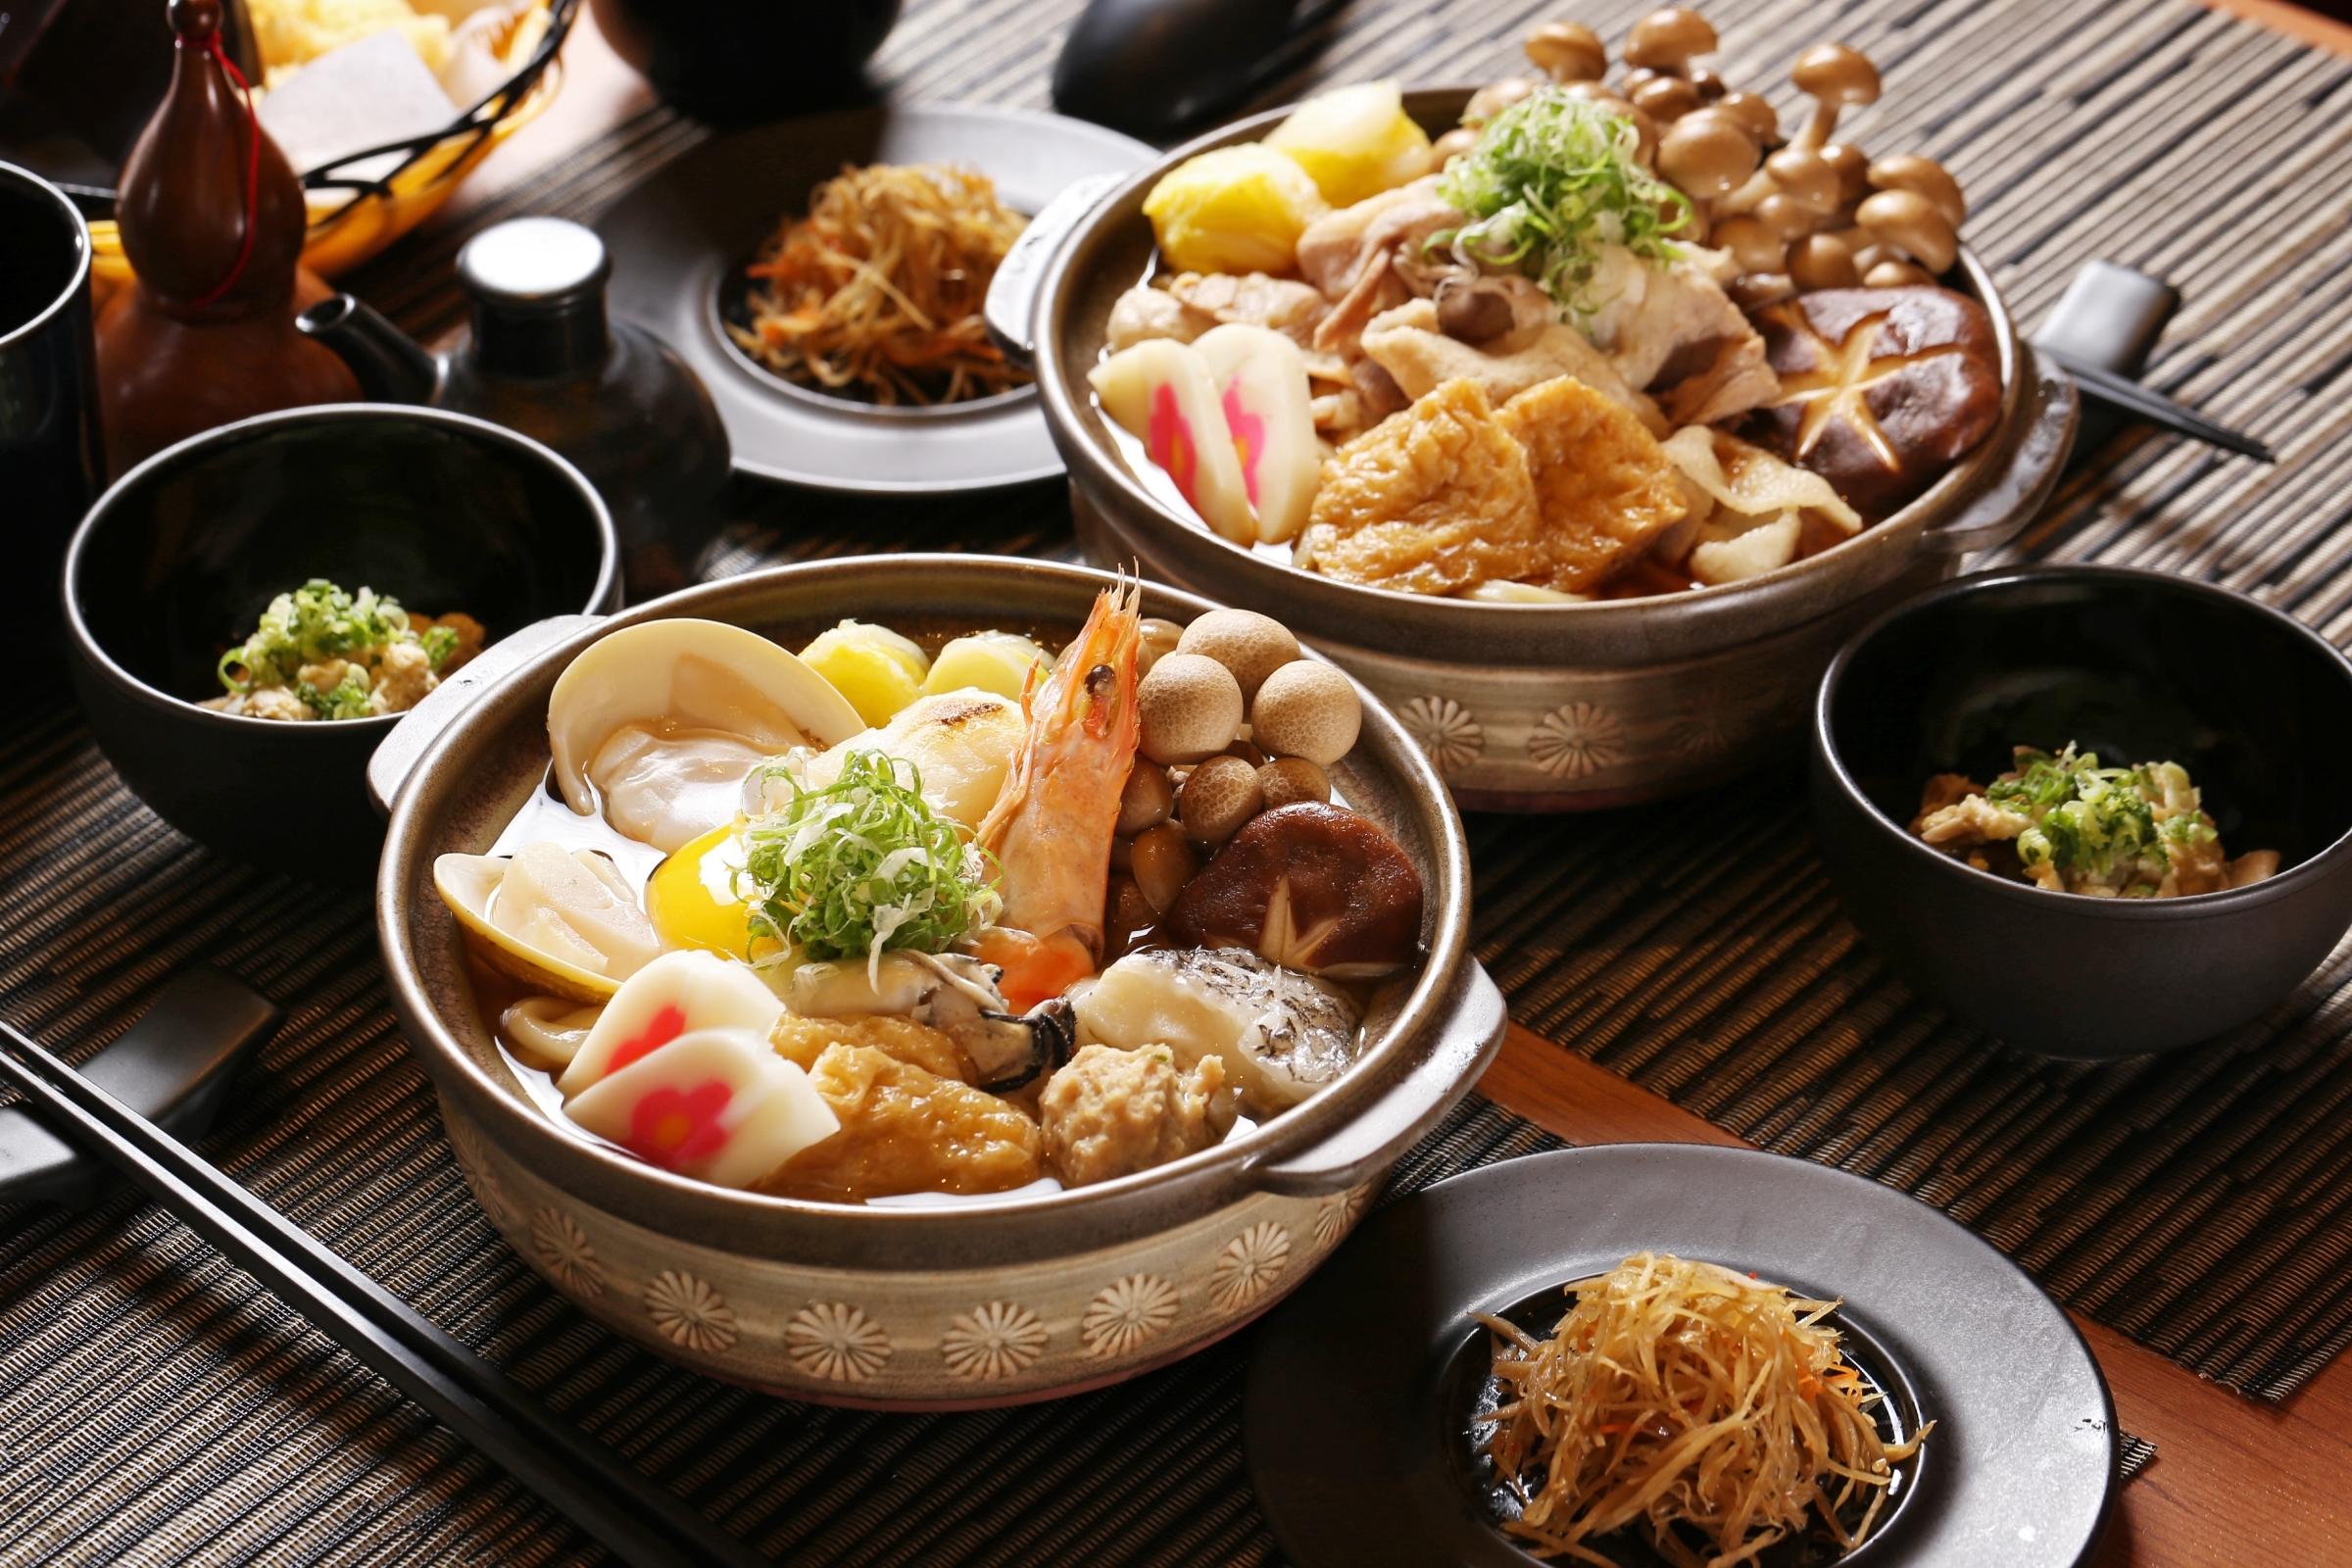 девушки японская кухня с картинками обгон